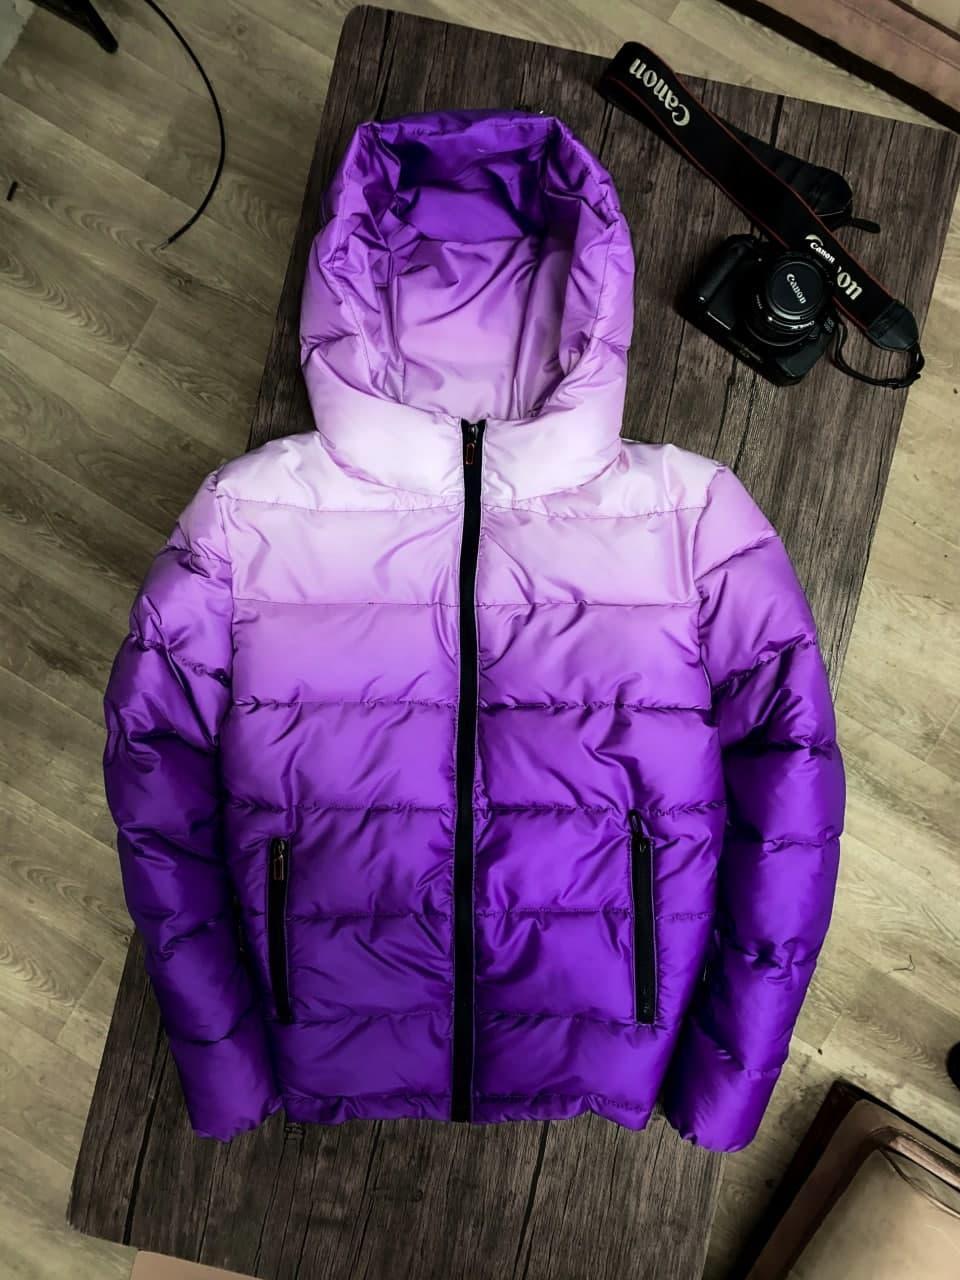 😜 Куртка - Мужская куртка с капюшоном / чоловіча куртка з капюшоном фіолетова